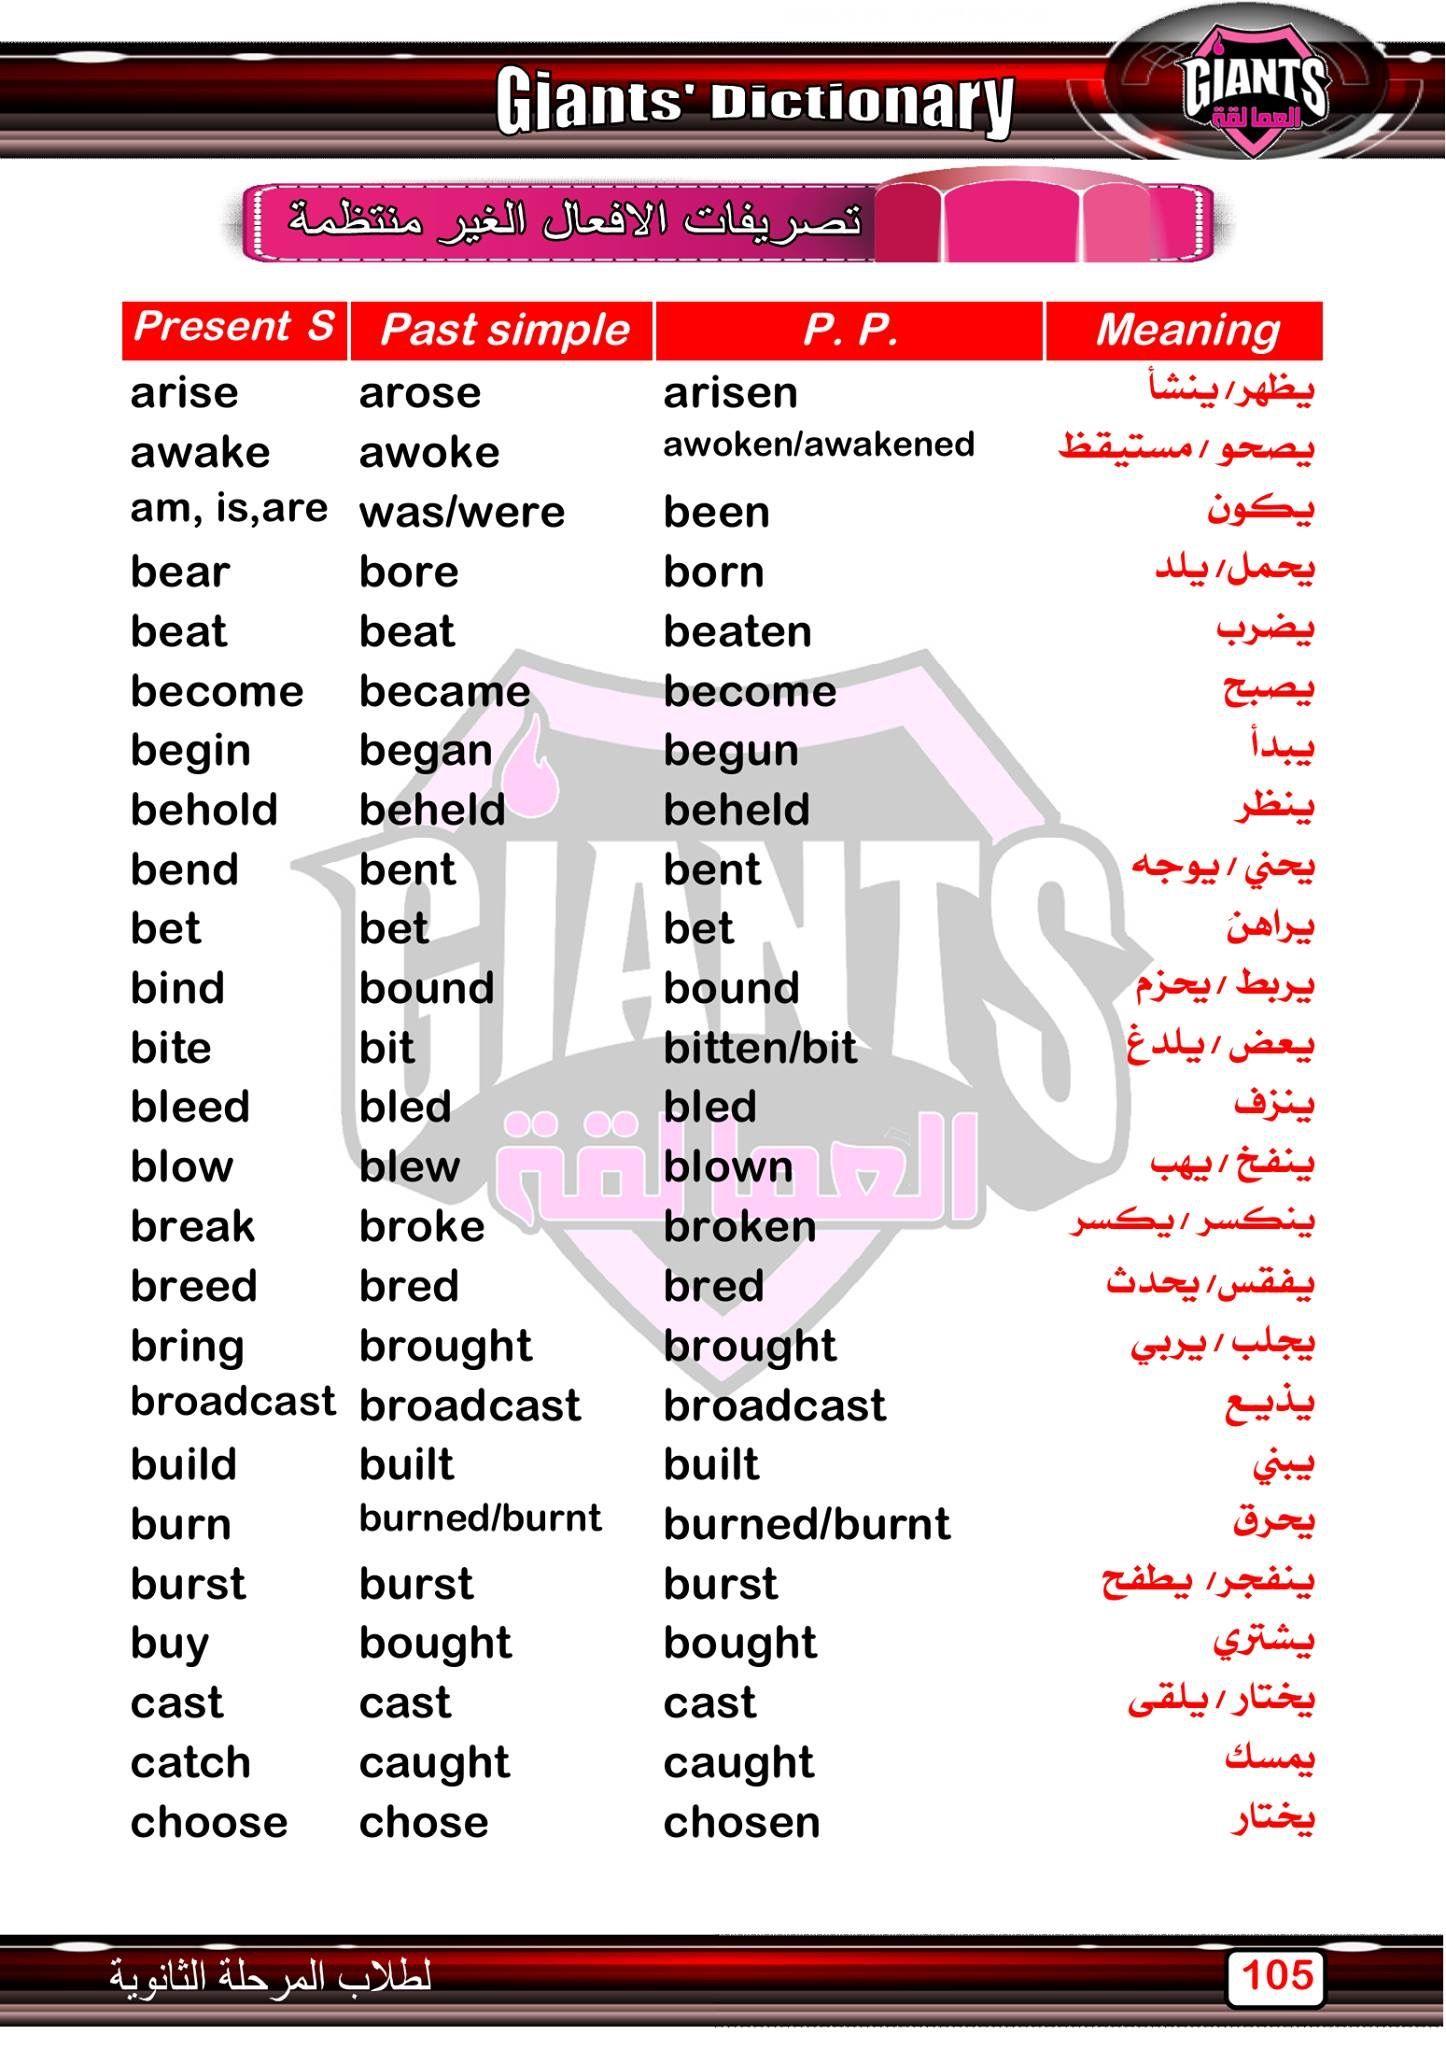 Vocabulary Amp Idioms Amp Phrasal Verbs